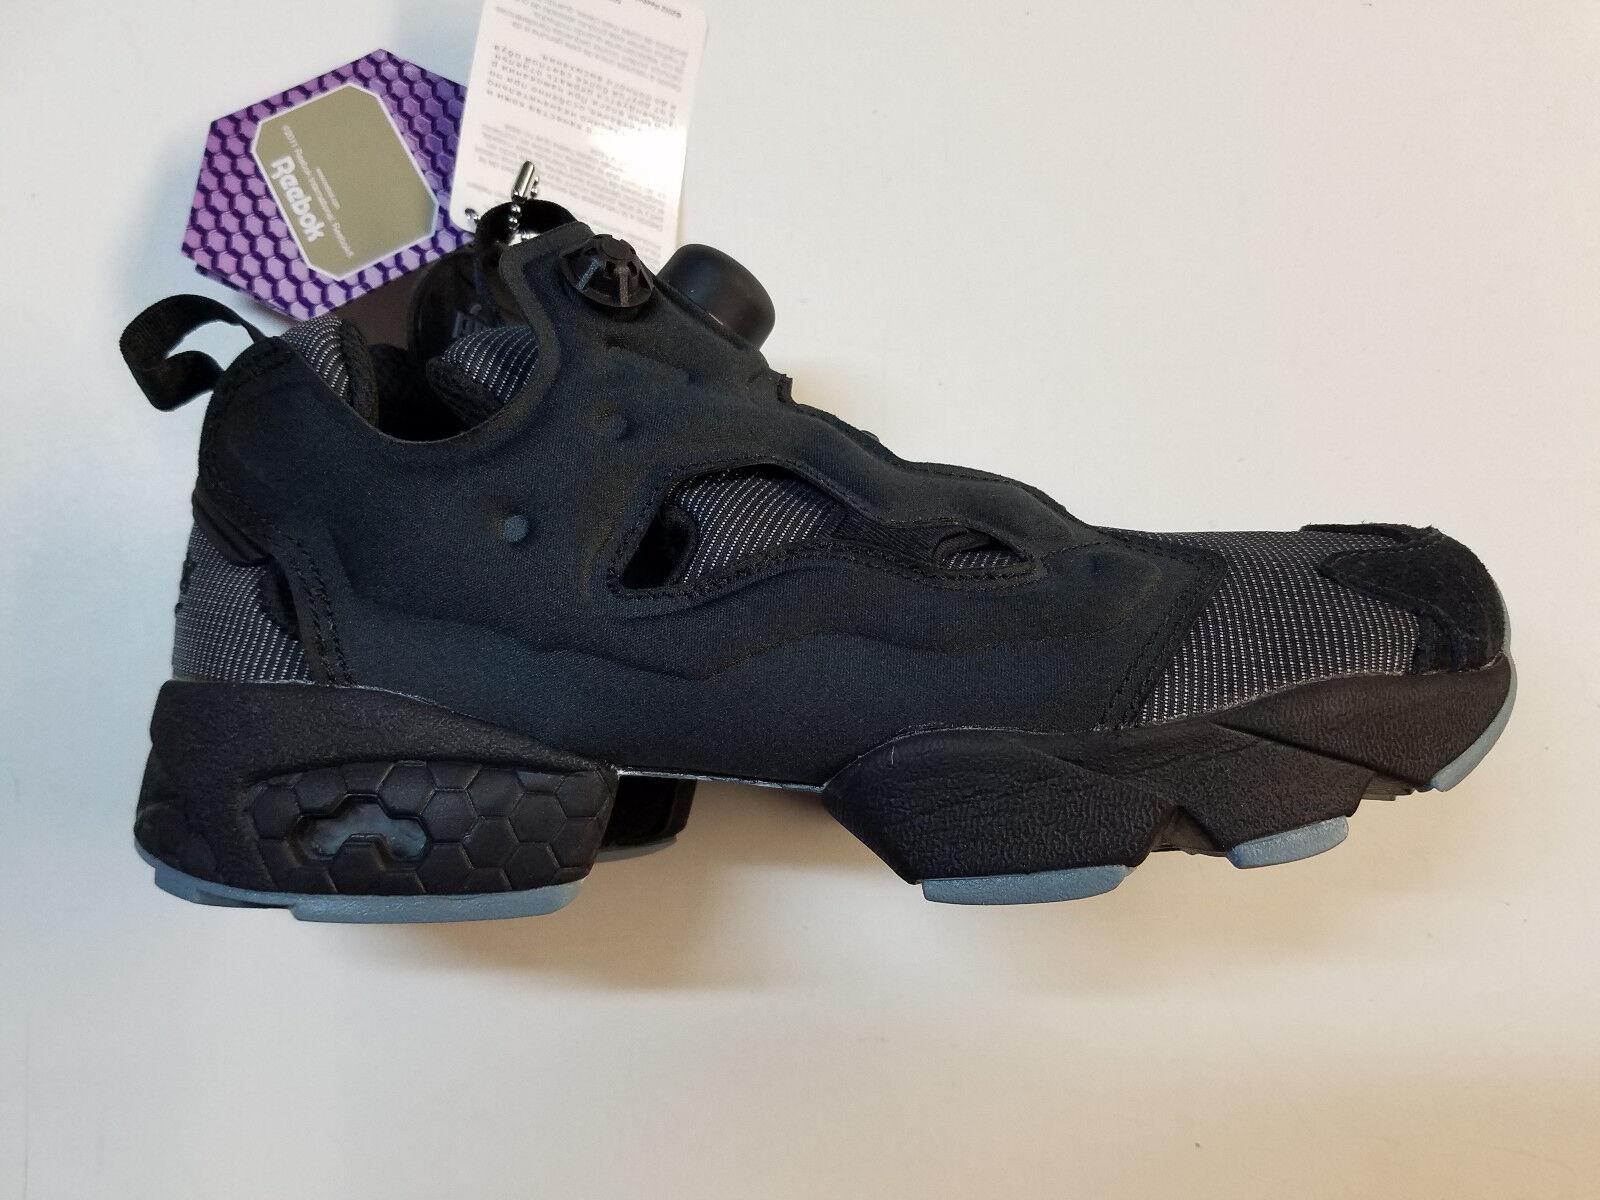 Reebok Instapump Fury MTP Black Grey Running Retro Mens Sneakers BD1502 1801-15